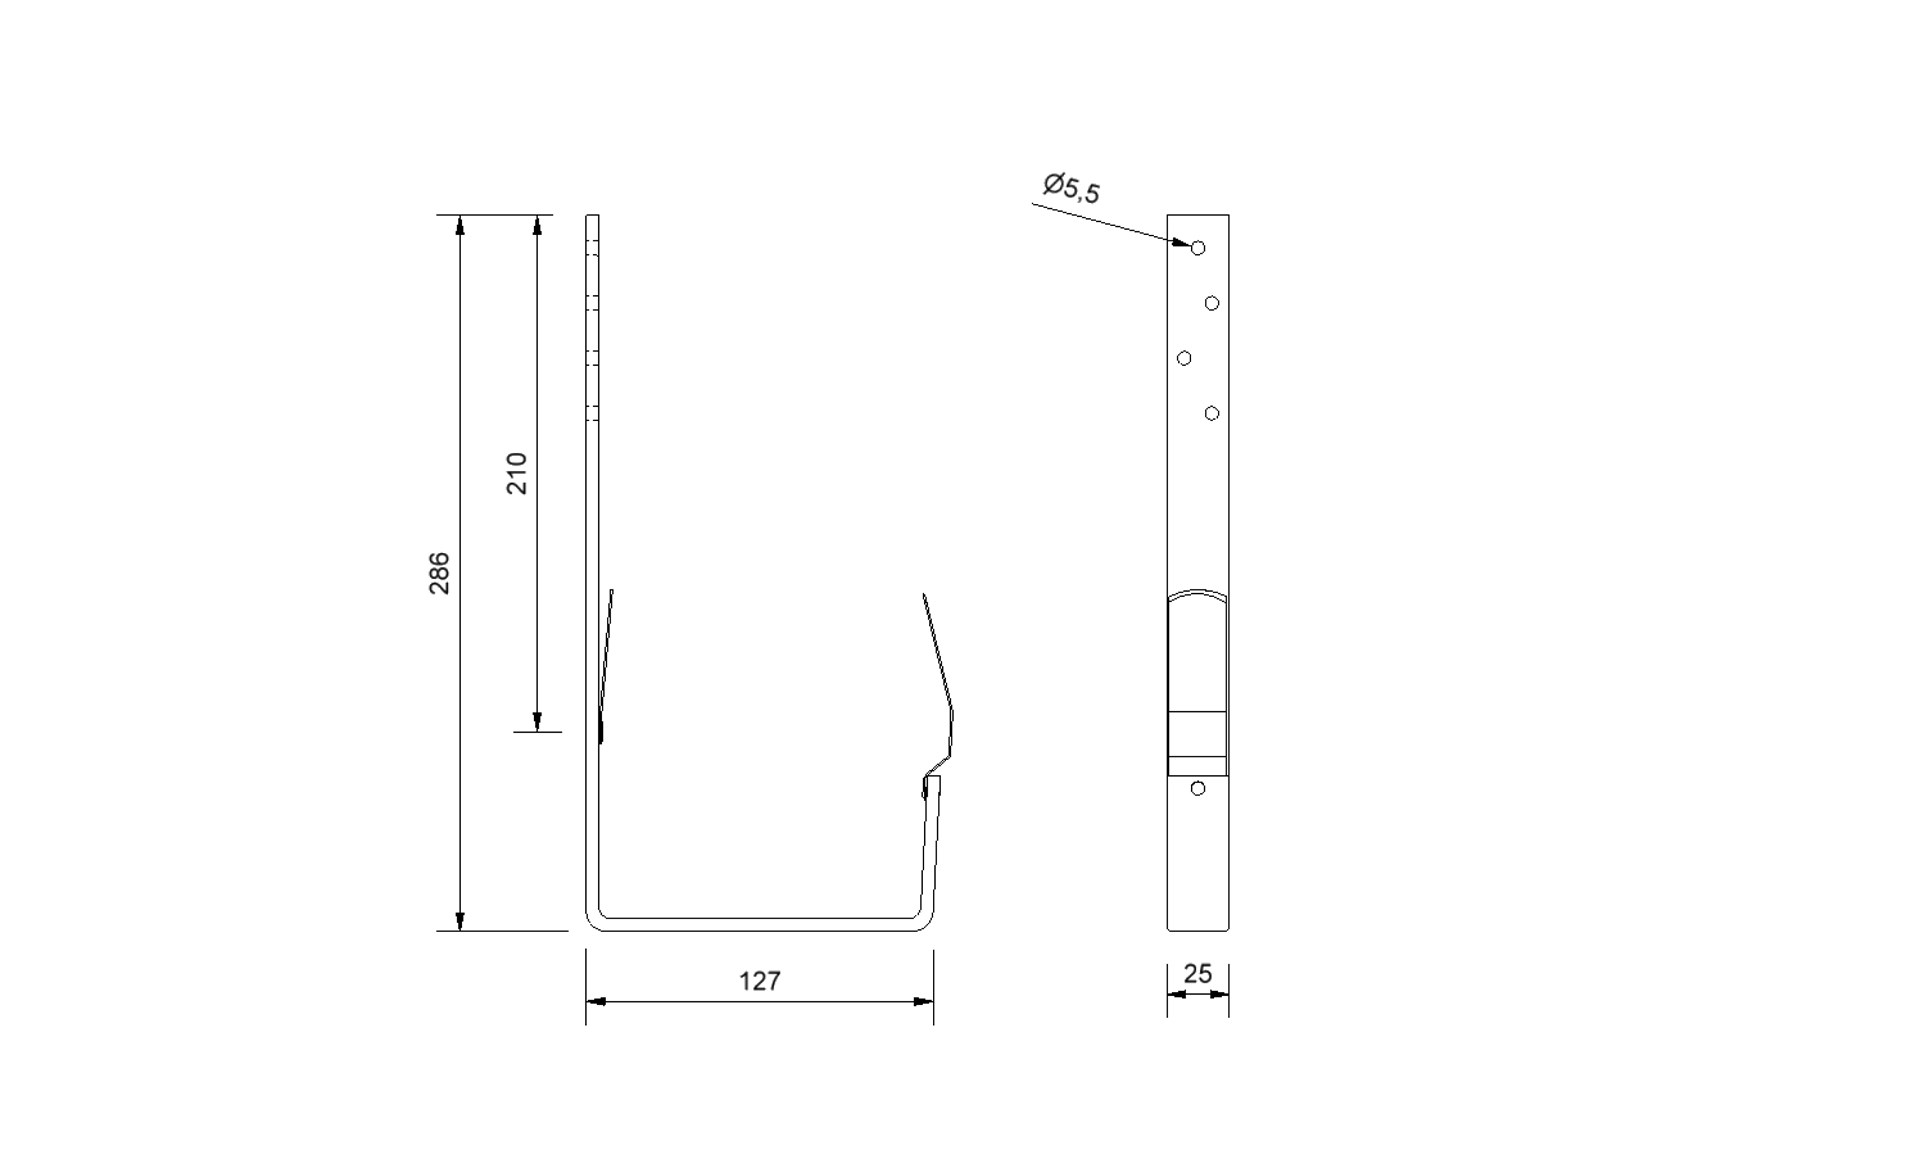 Plannja Rännkrok Square 345 profilgeometri